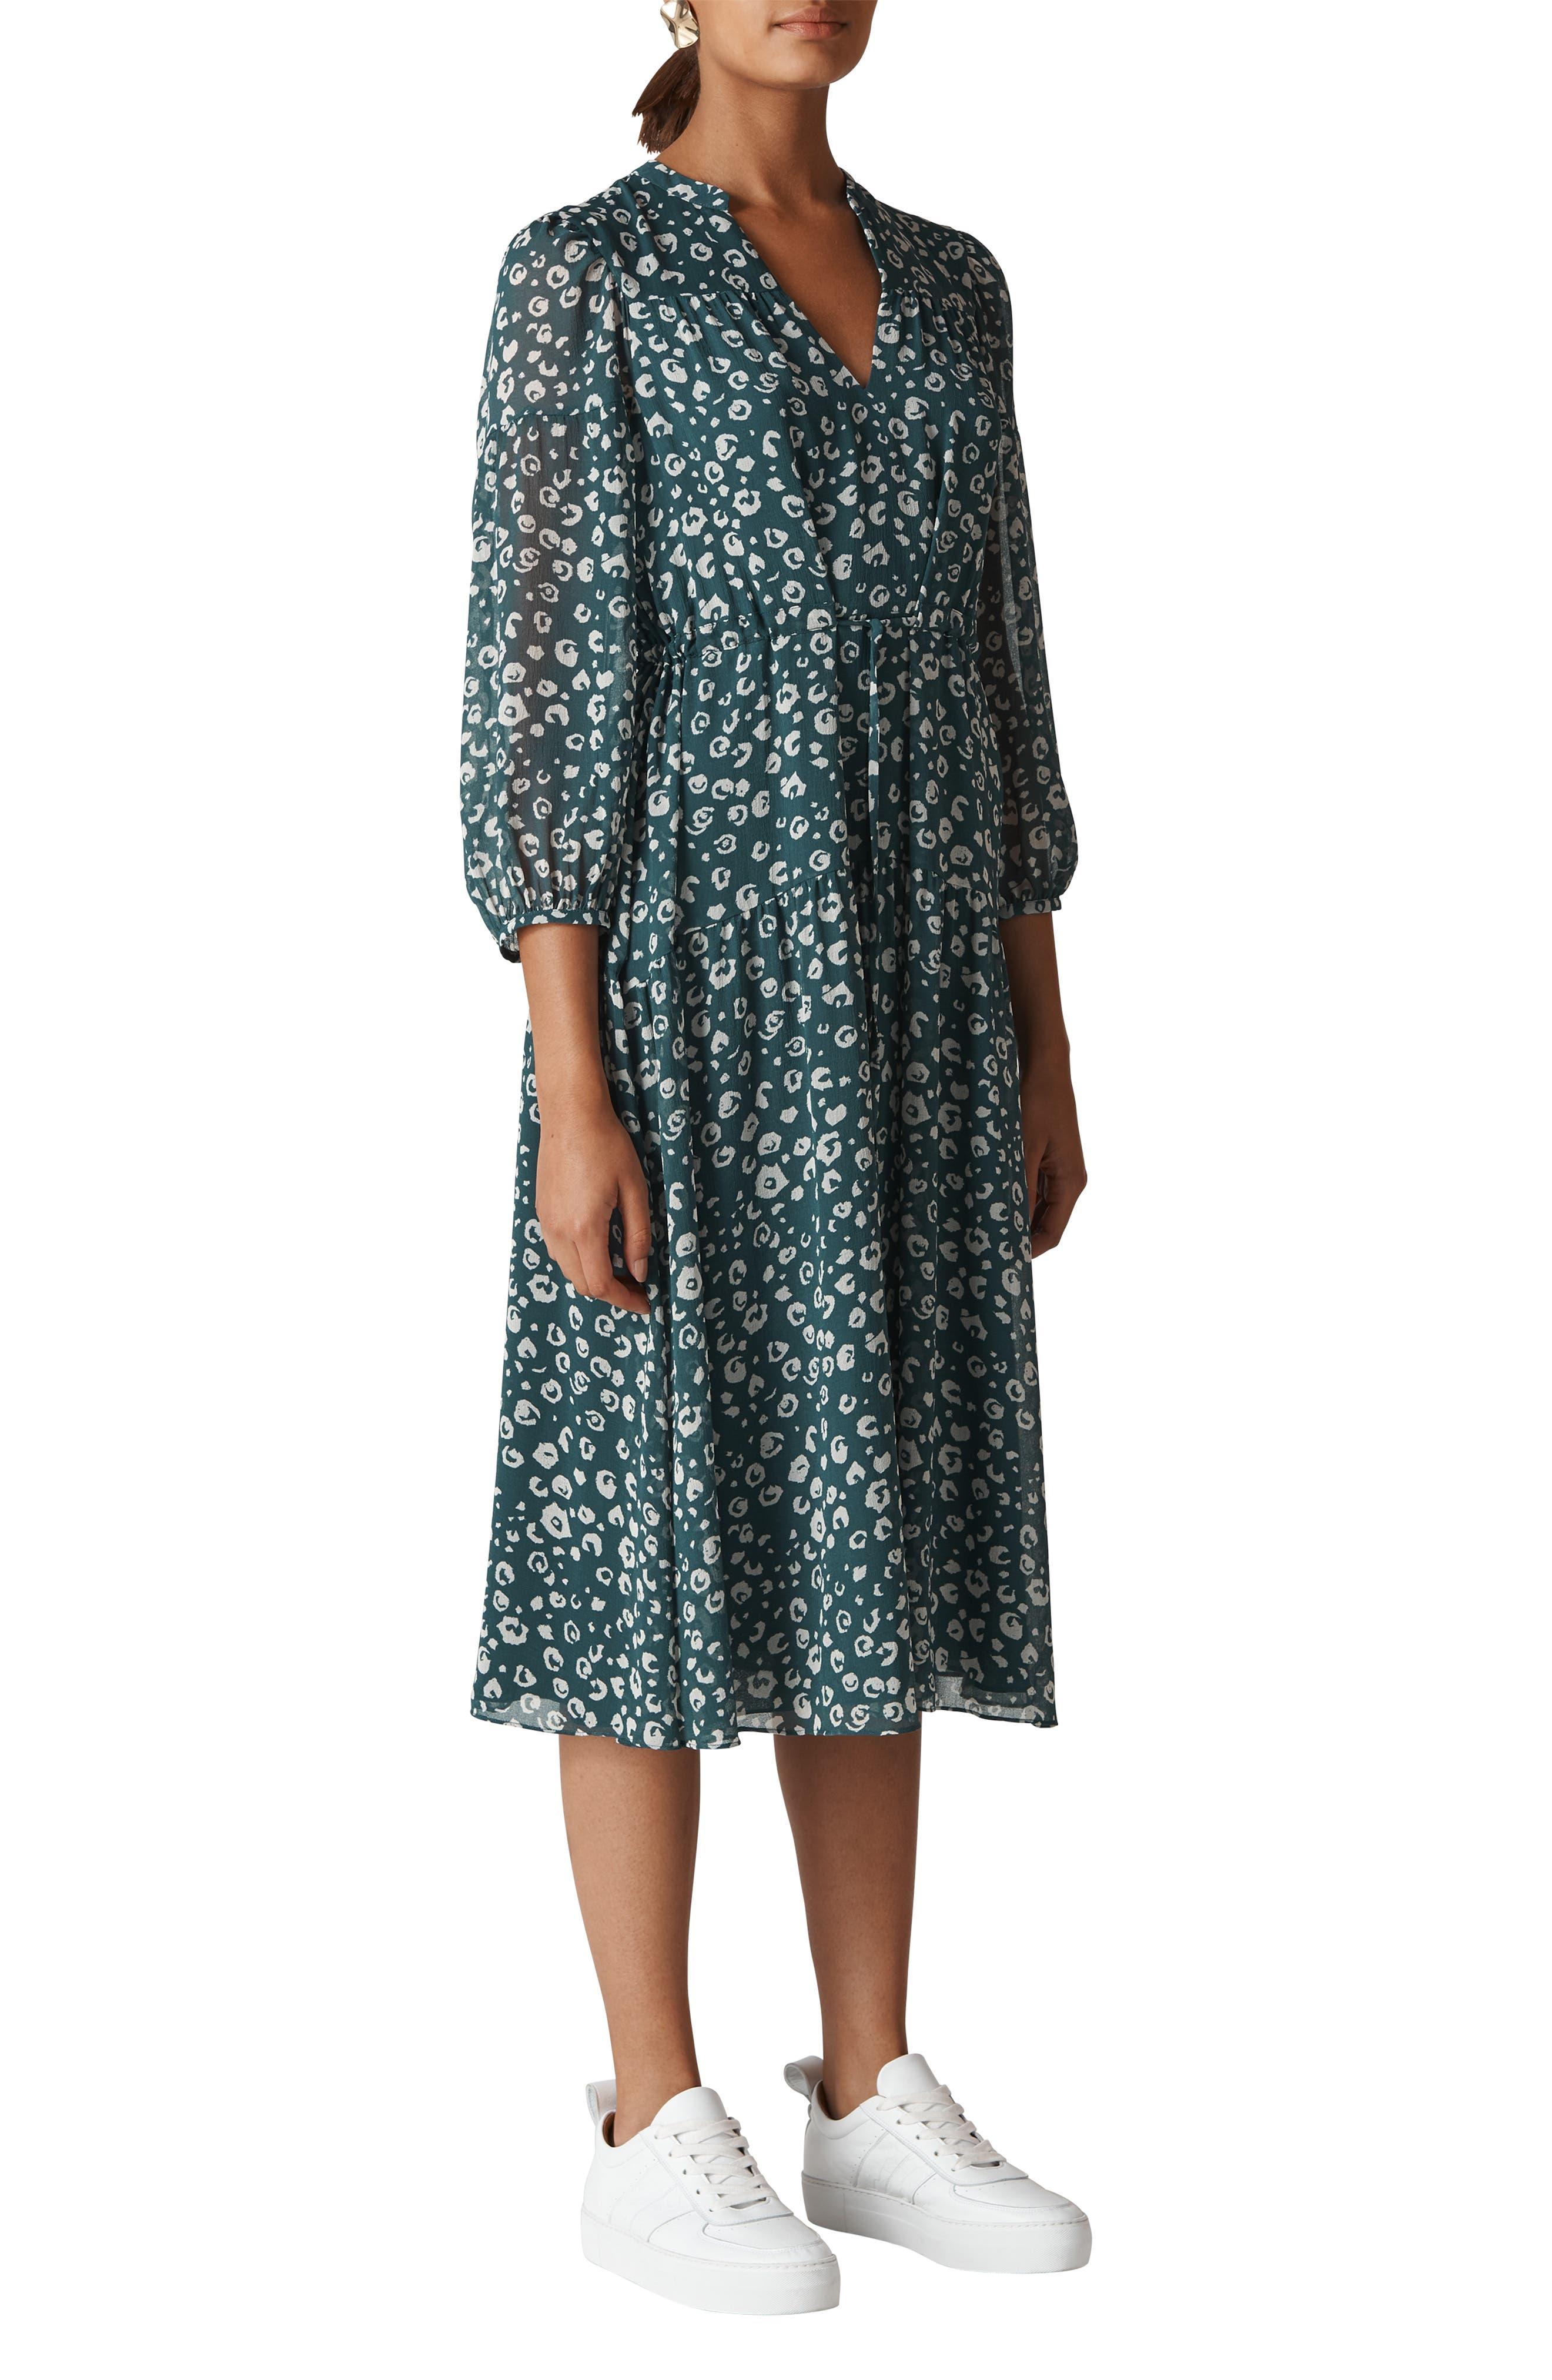 Adrianna Cheetah Print Midi Dress,                         Main,                         color, GREEN/ MULTI